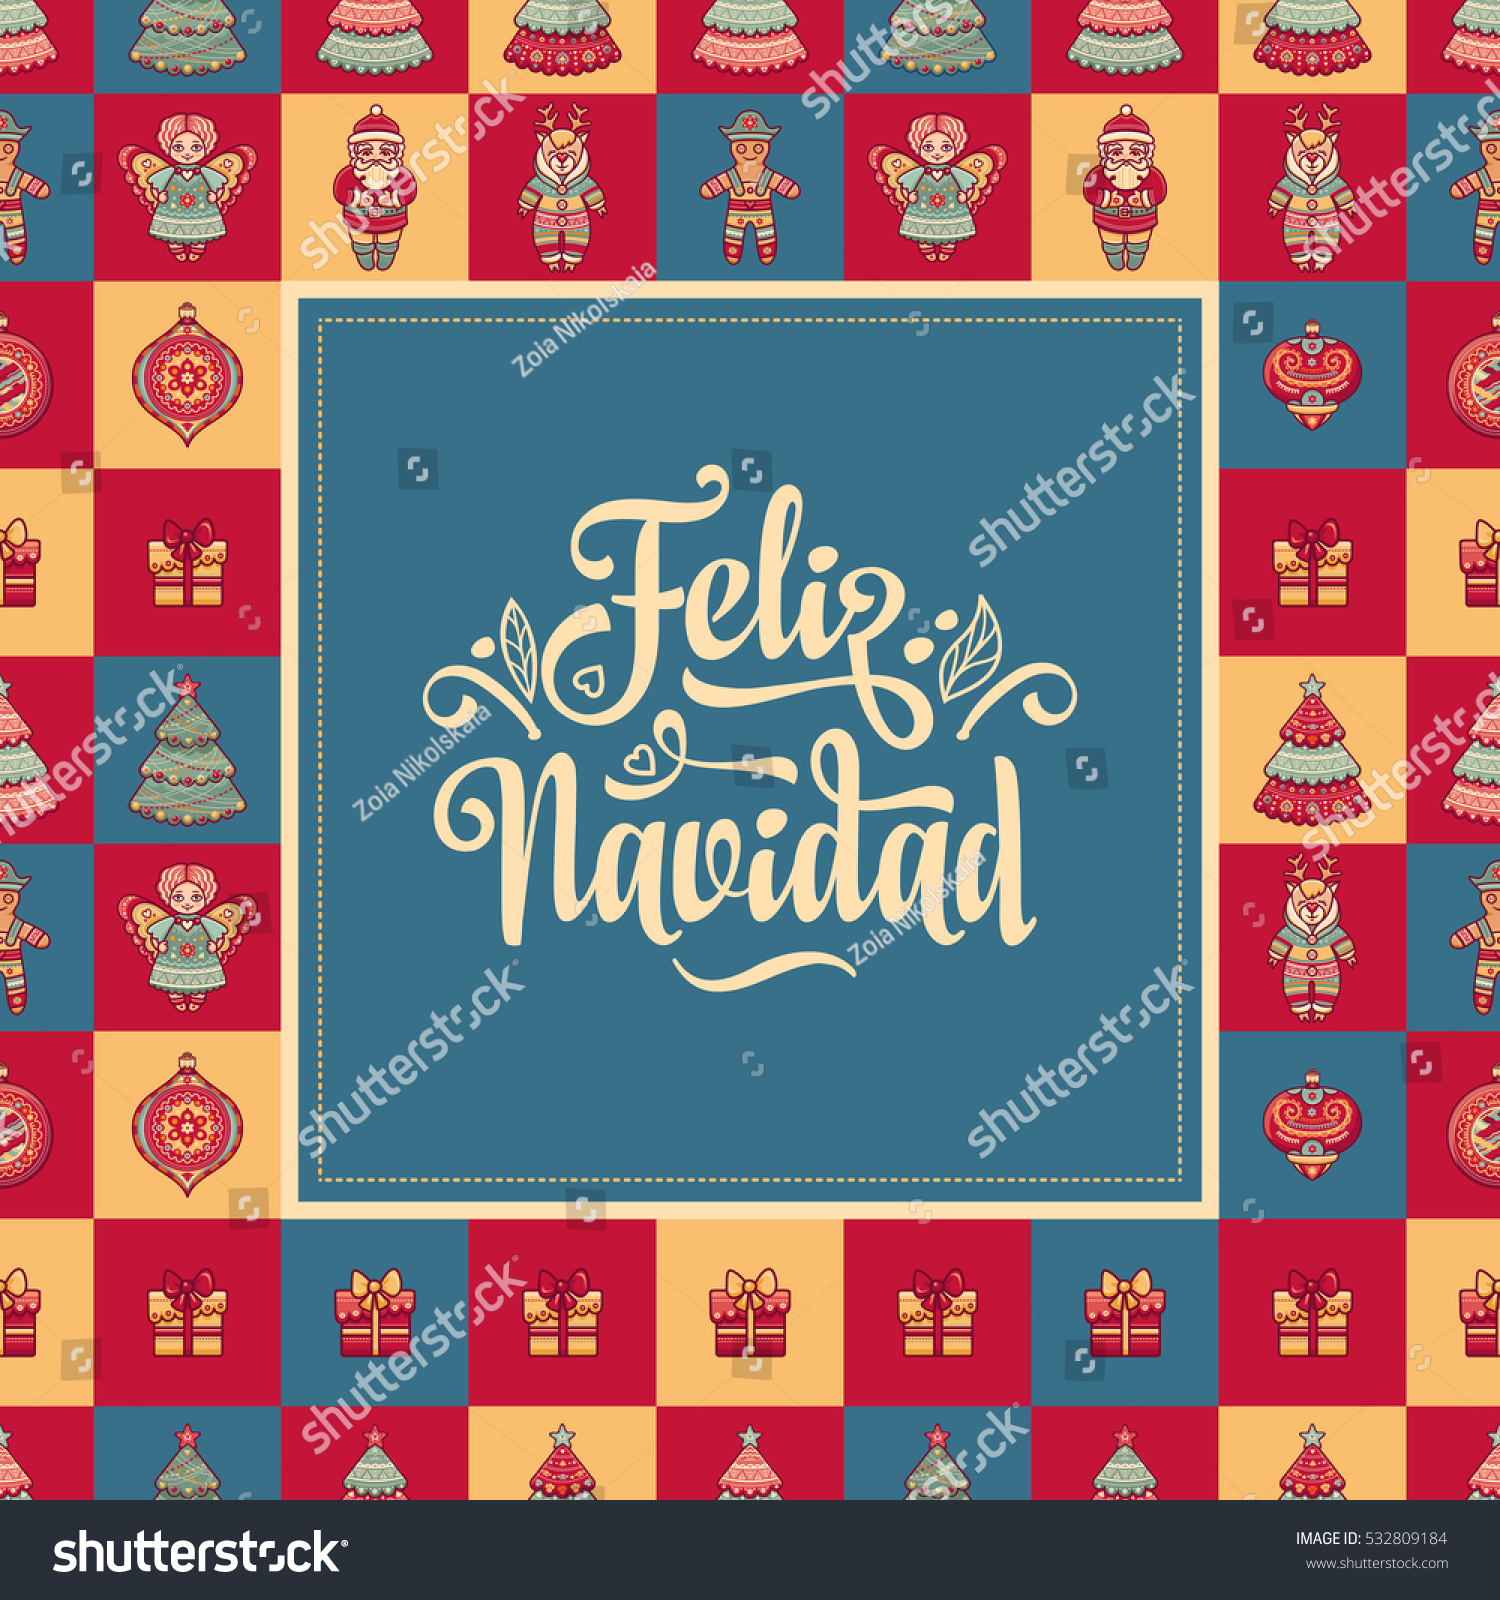 Feliz Navidad Xmas Card On Spanish Language Warm Wishes